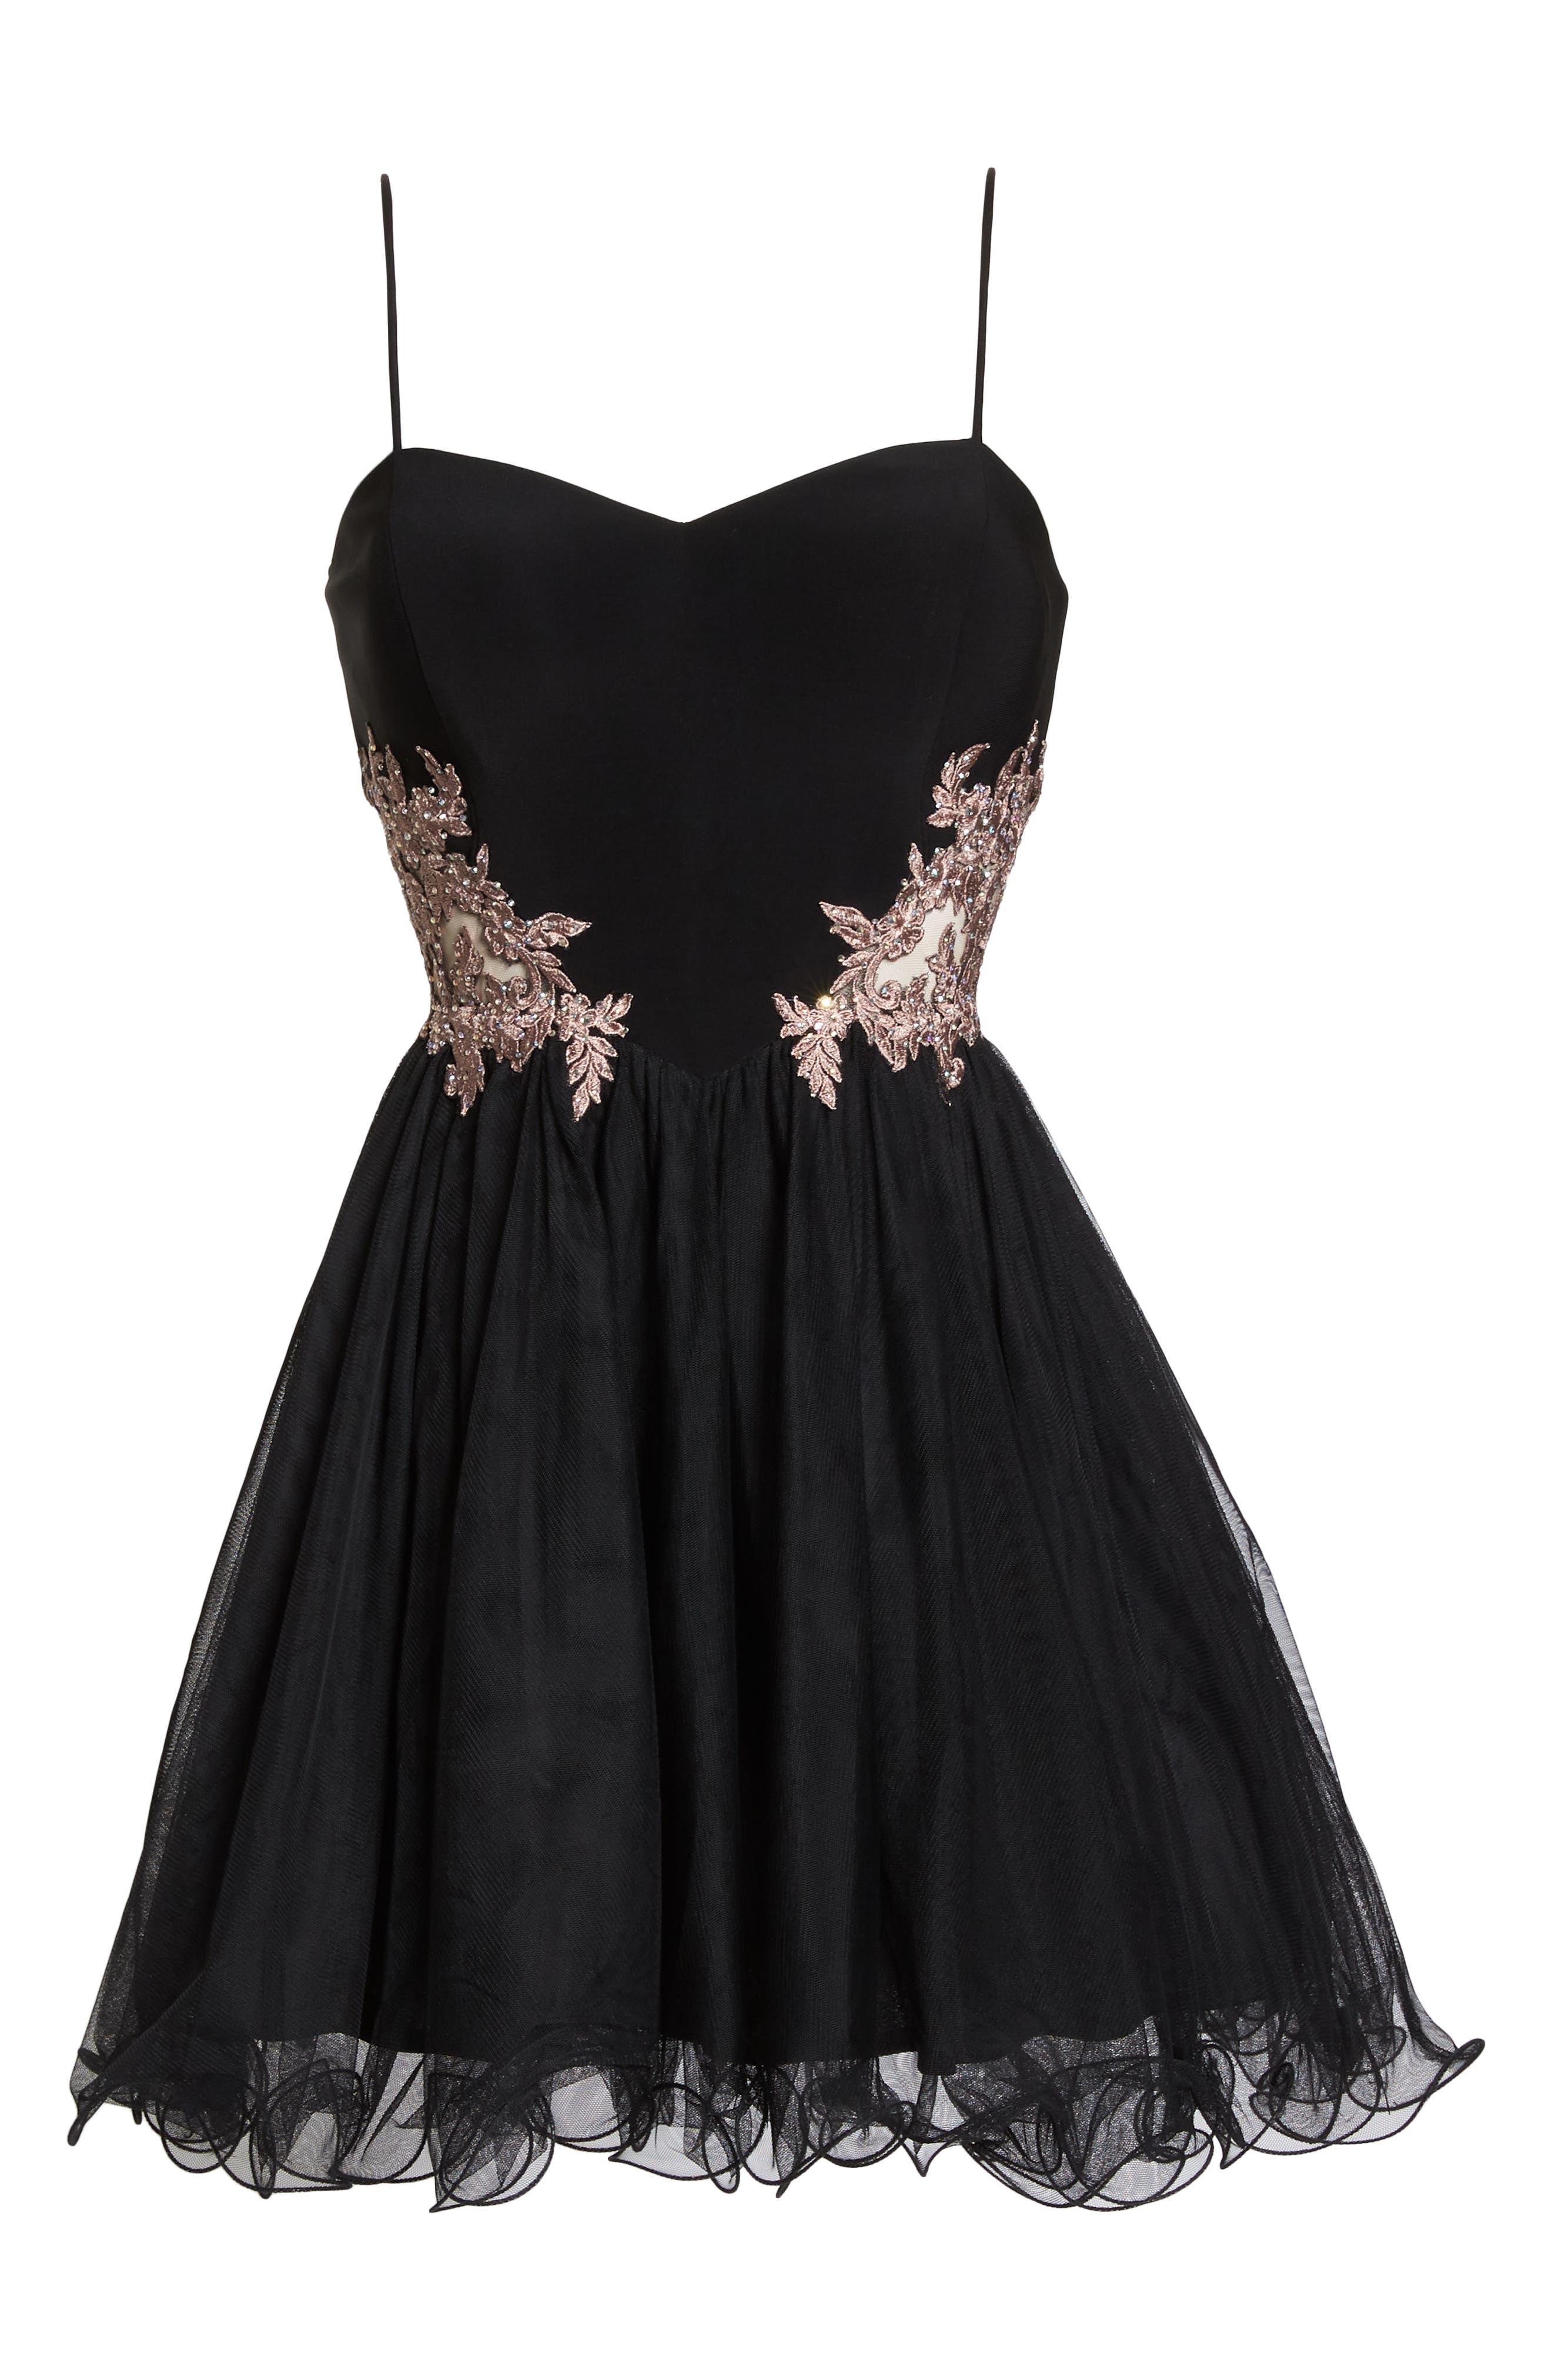 Appliqué Sweetheart Fit & Flare Dress,                             Alternate thumbnail 7, color,                             BLACK/ ROSE